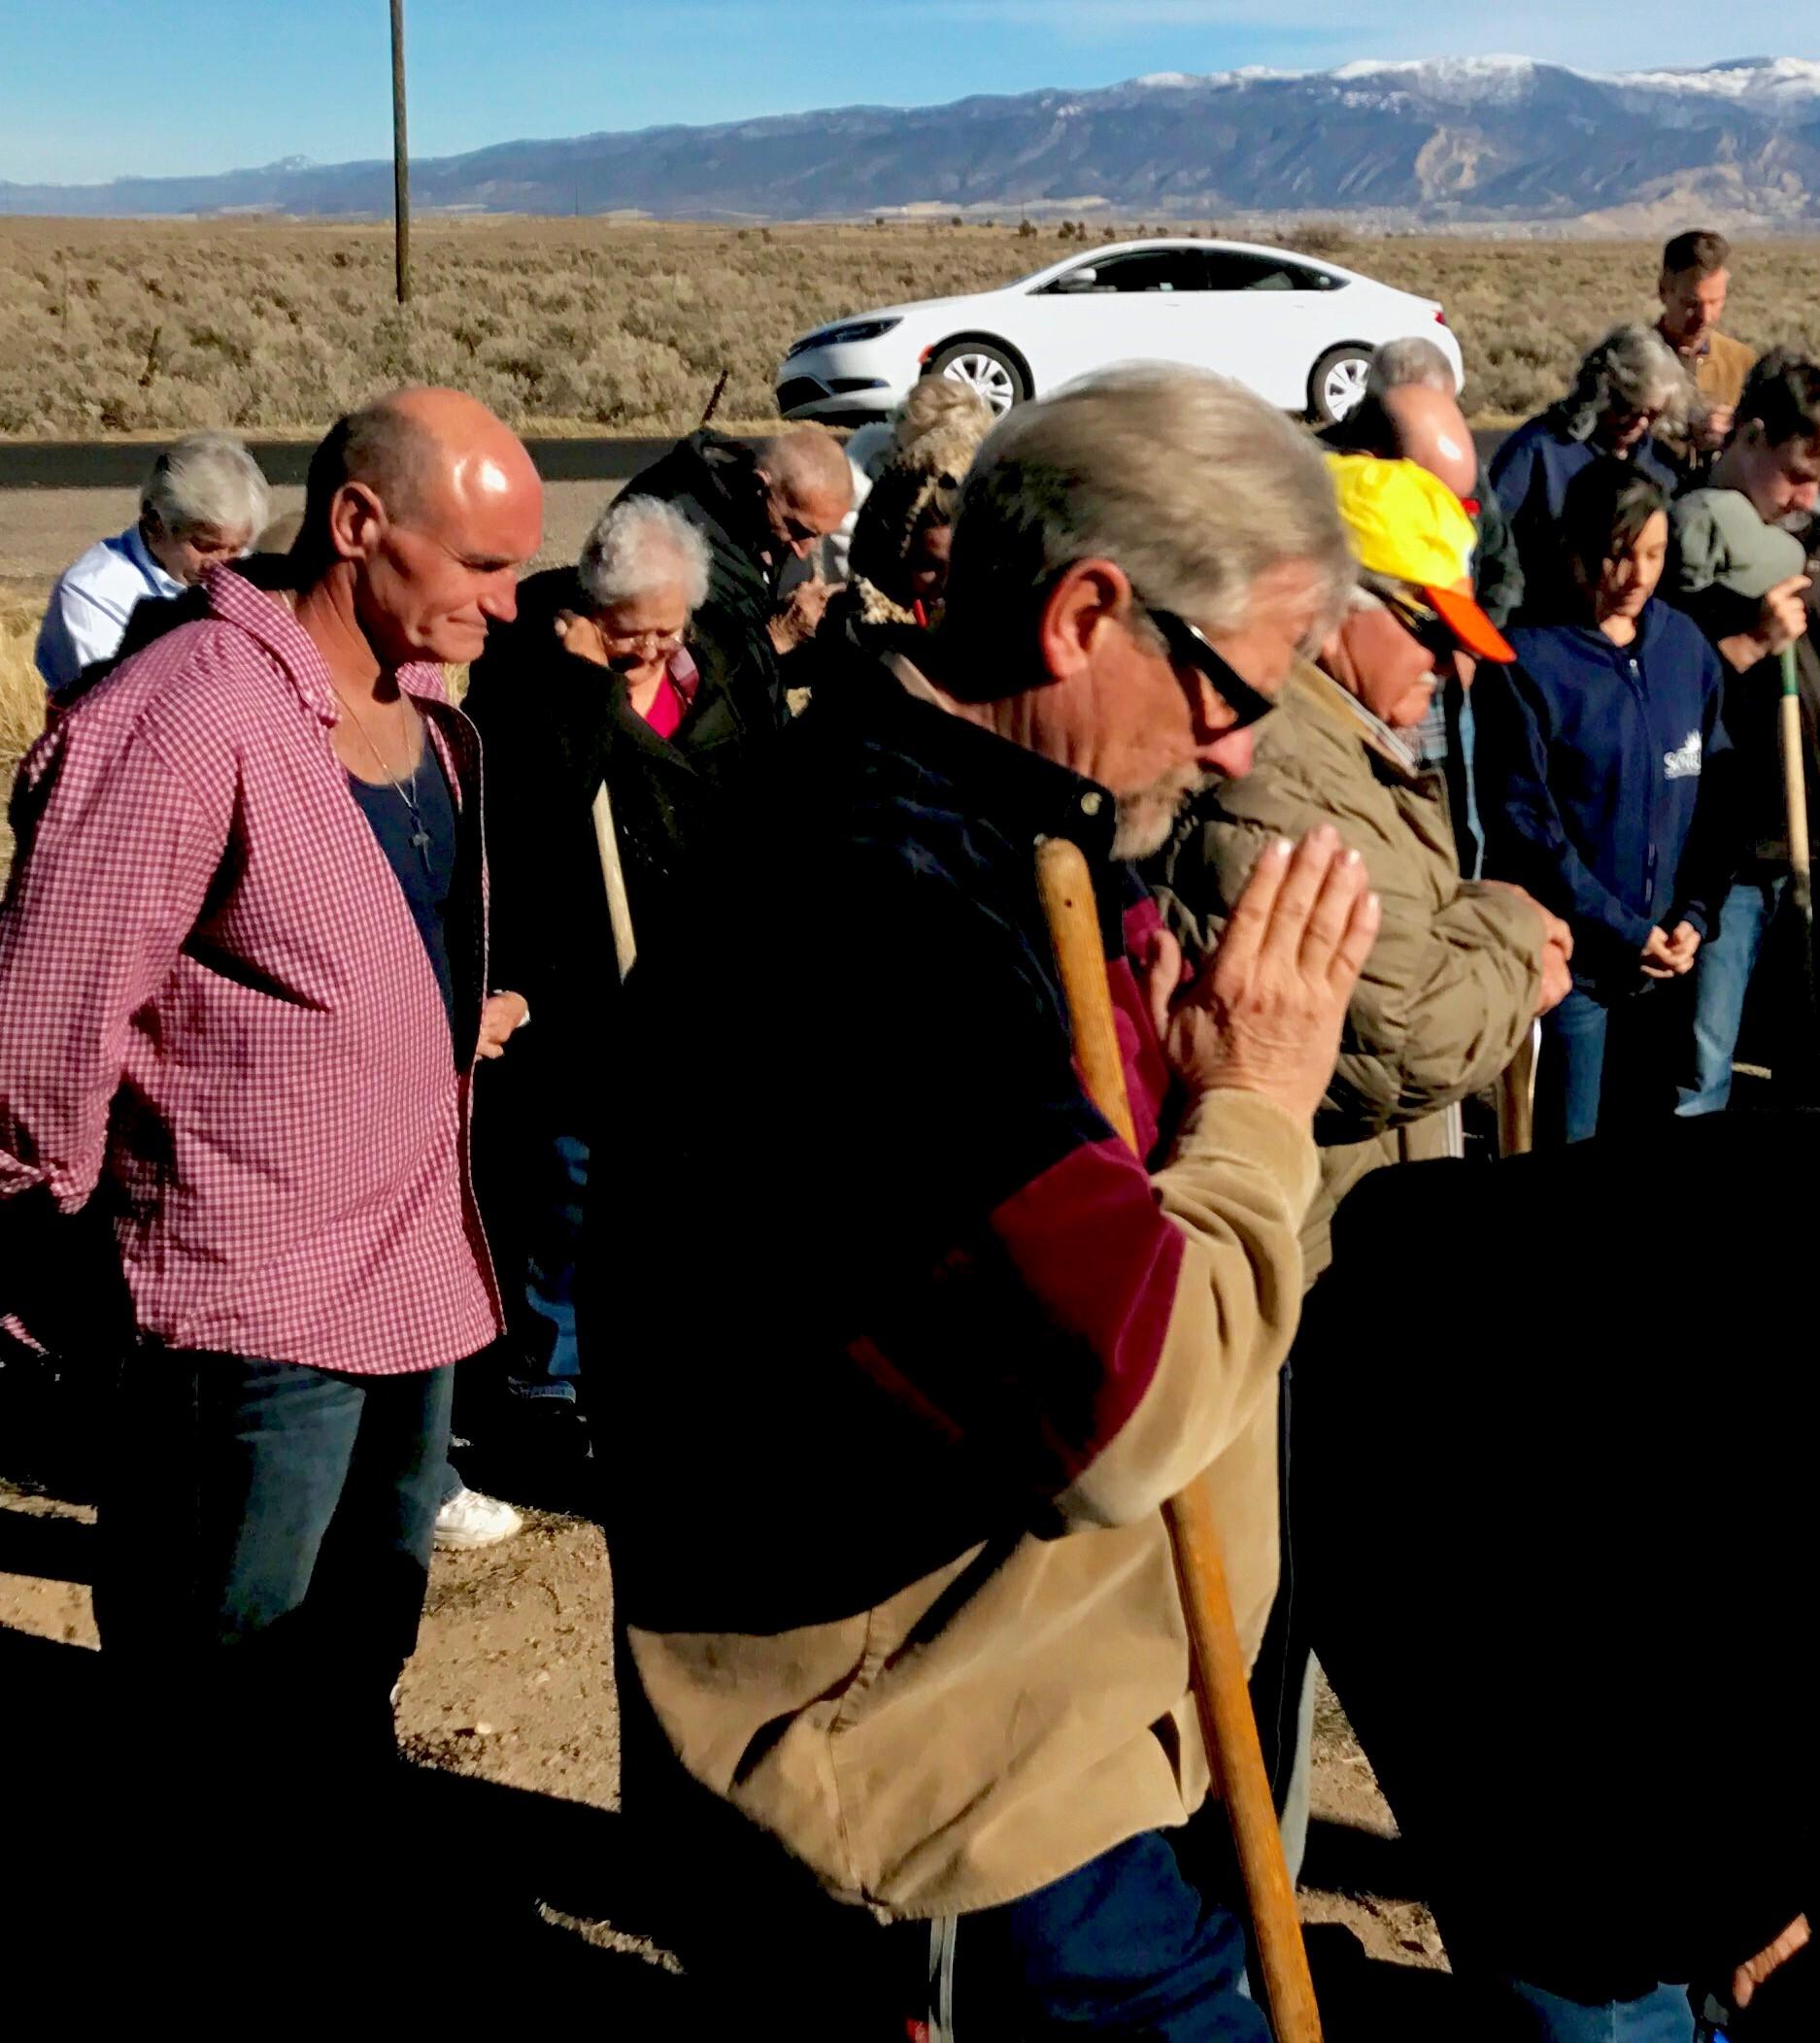 Church members pray as Pastor Jim Vasquez dedicates the property where the new Sonrise Fellowship Church will be built. Iron County, Utah, Dec. 4, 2016 | Photo by Tracie Sullivan, St. George News / Cedar City News